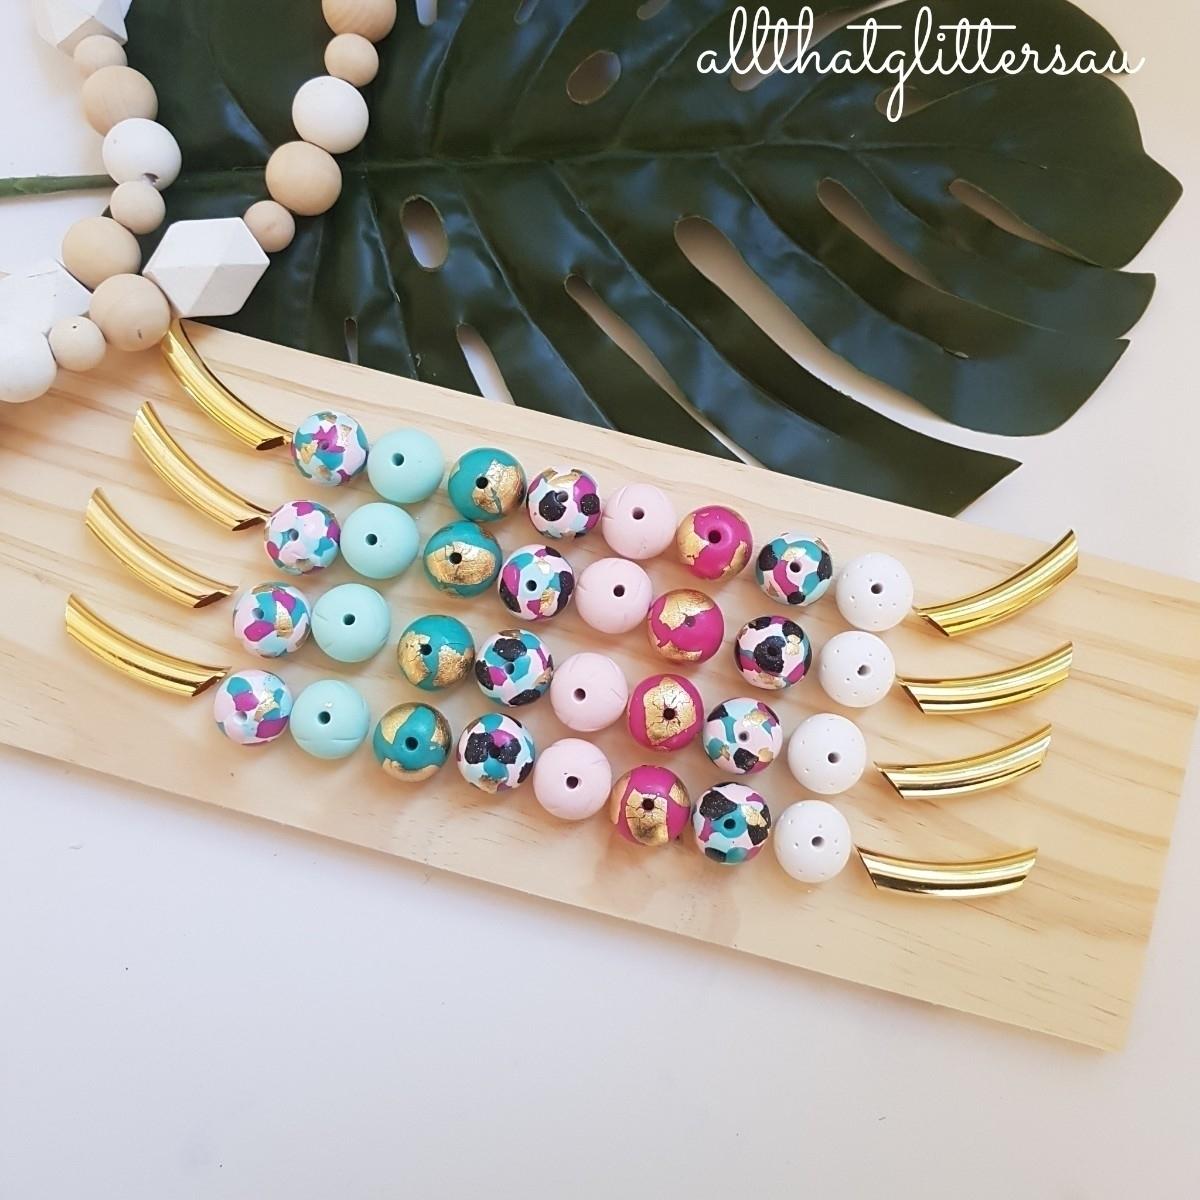 All That Glitters AU (@allthatglittersau) Cover Image